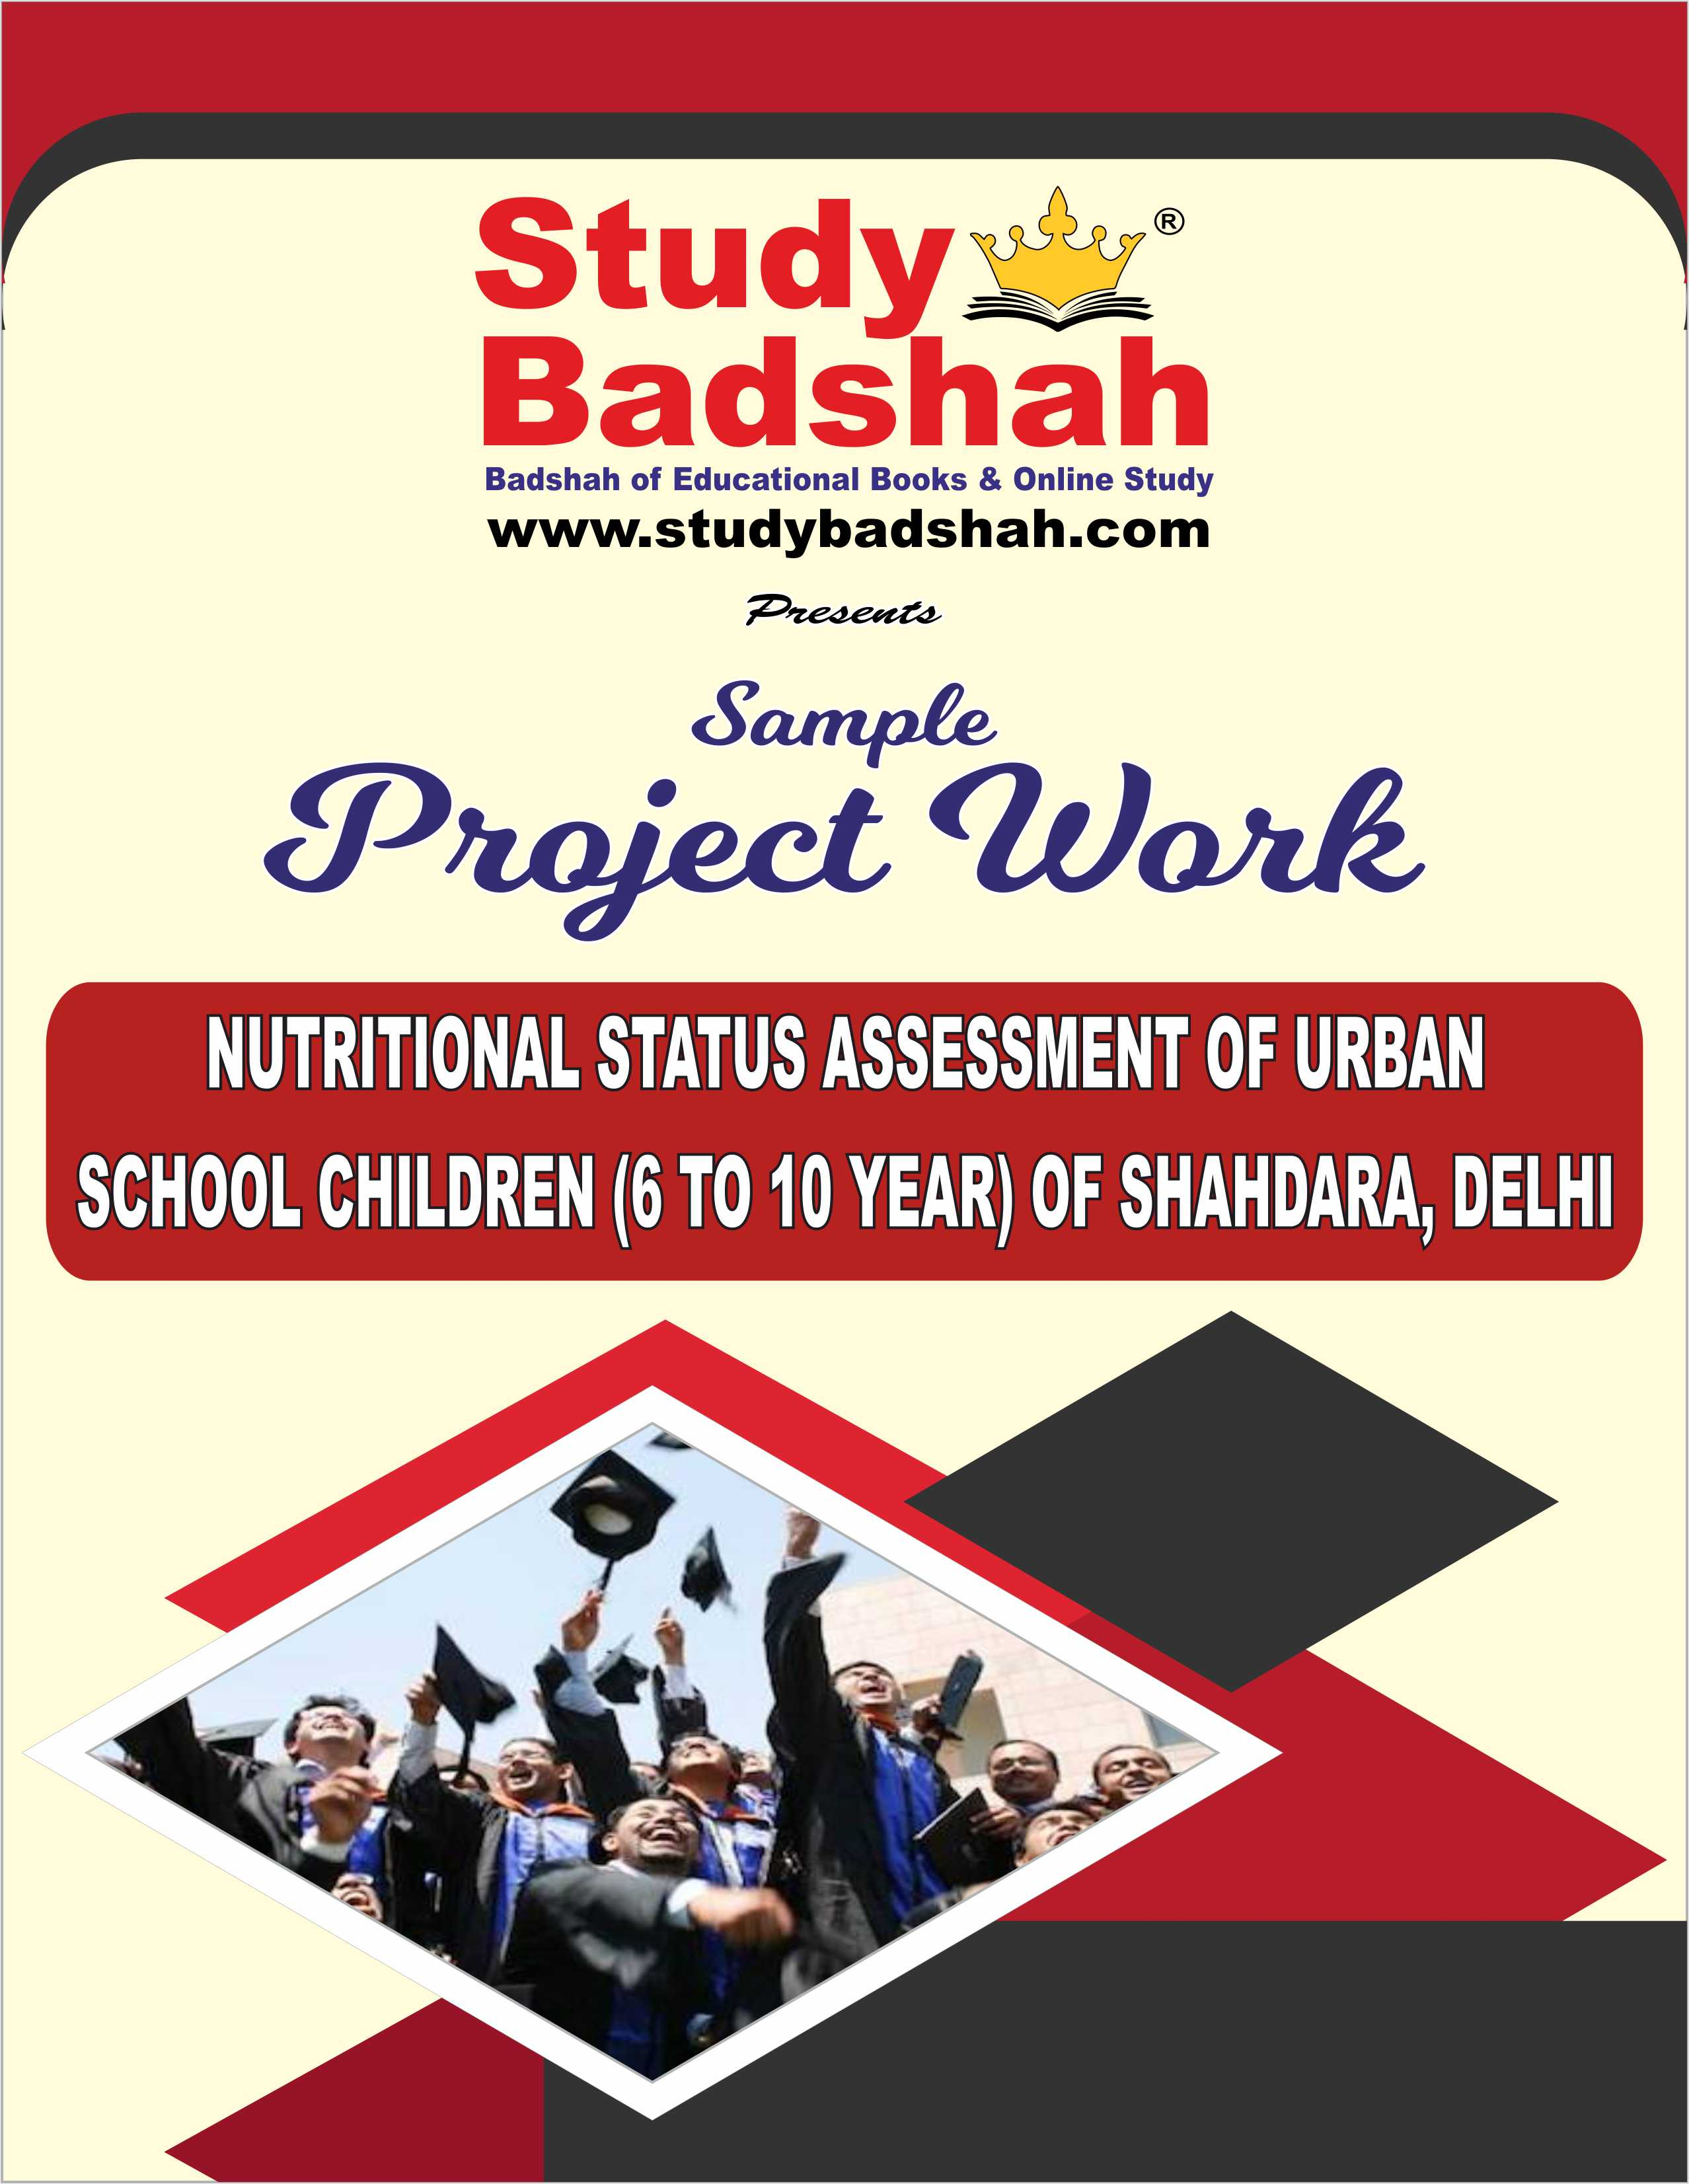 Nutritional Status Assessment of Urban School Children (6 to 10 year) of Shahdara, Delhi